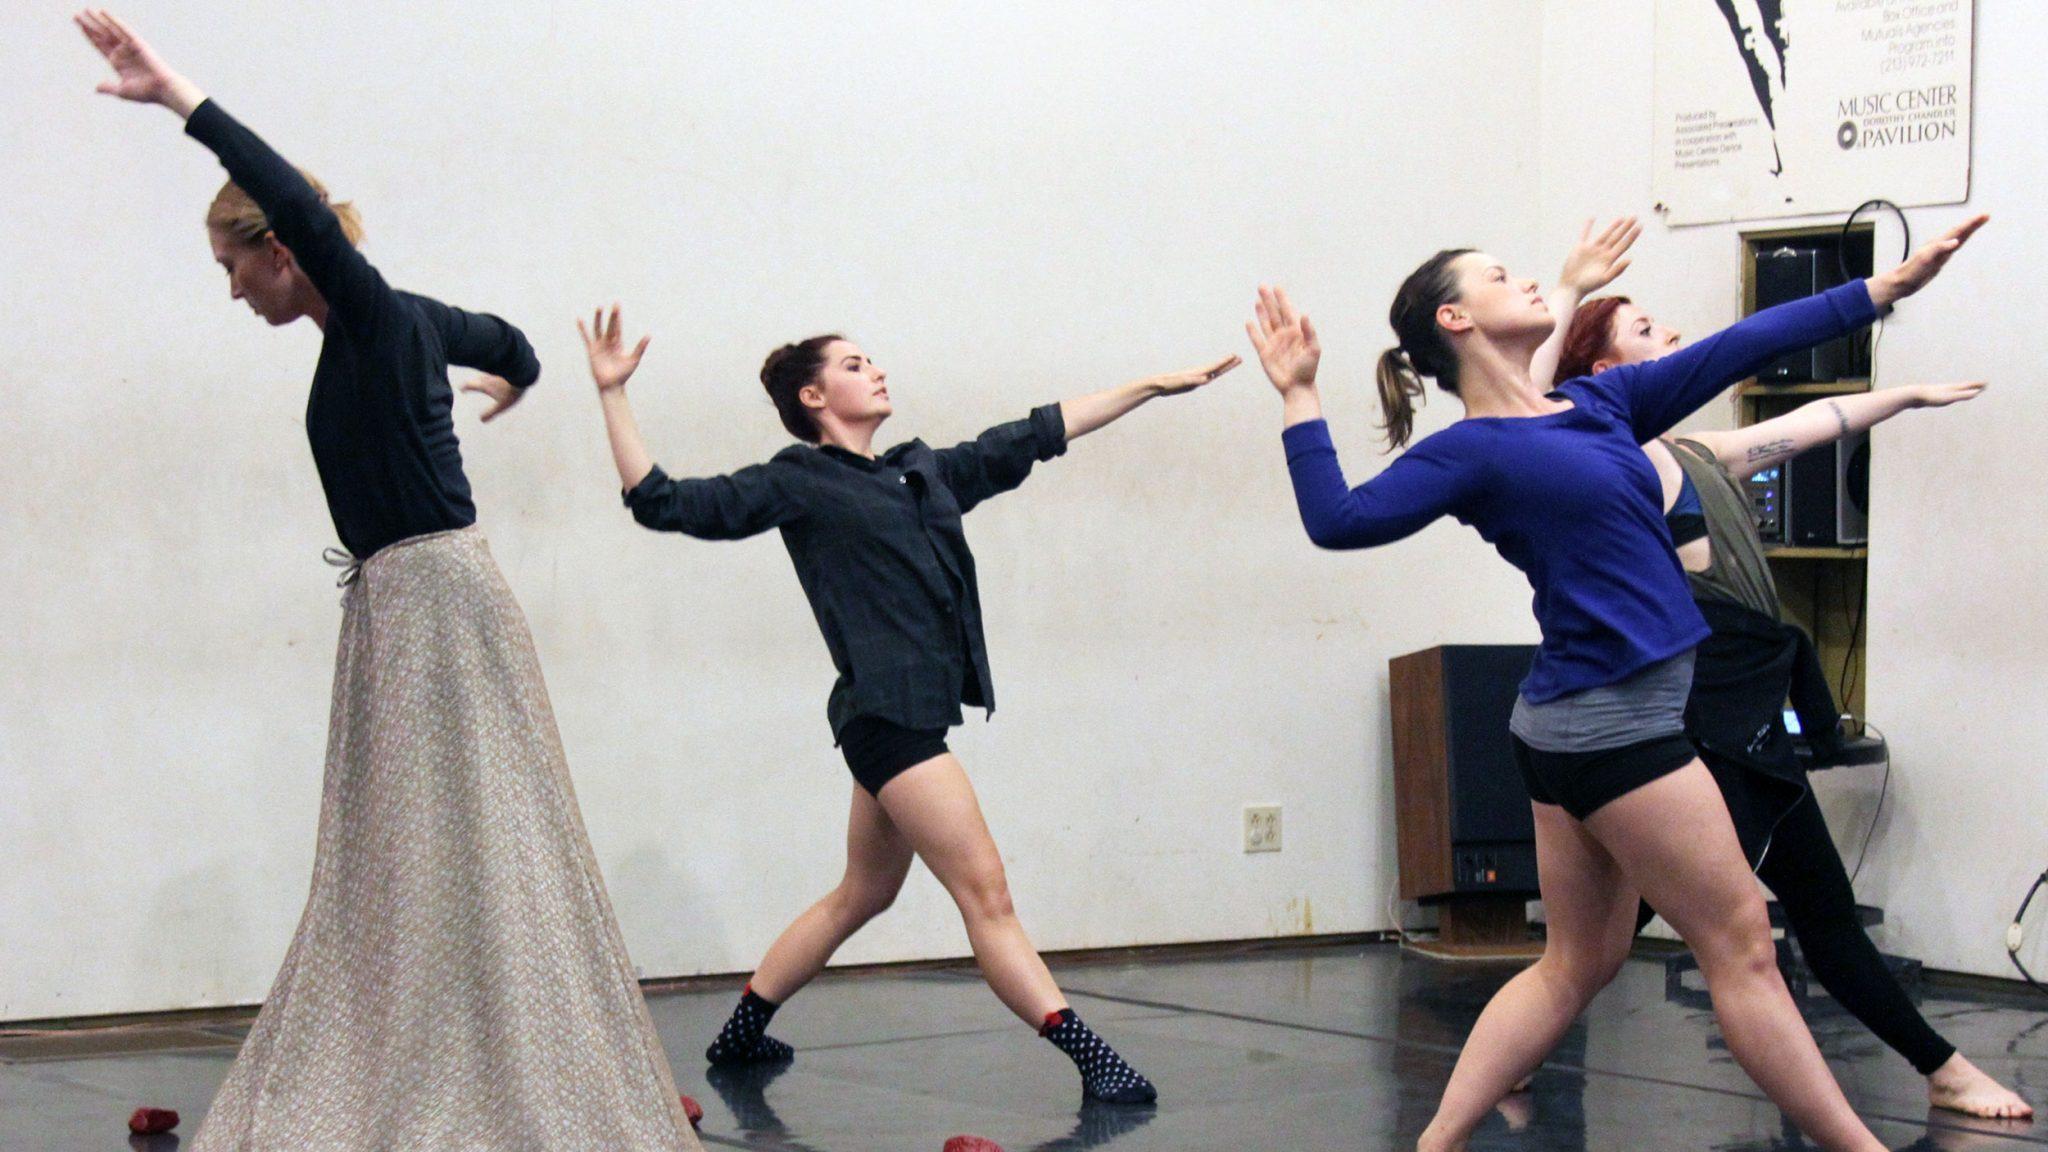 Monique A. LeBleu Rachelle Donofrio of DanceArt rehearses at the former Bella Lewitski Dance Studios for an upcoming show, Universal City, Monday, November 1, 2015.